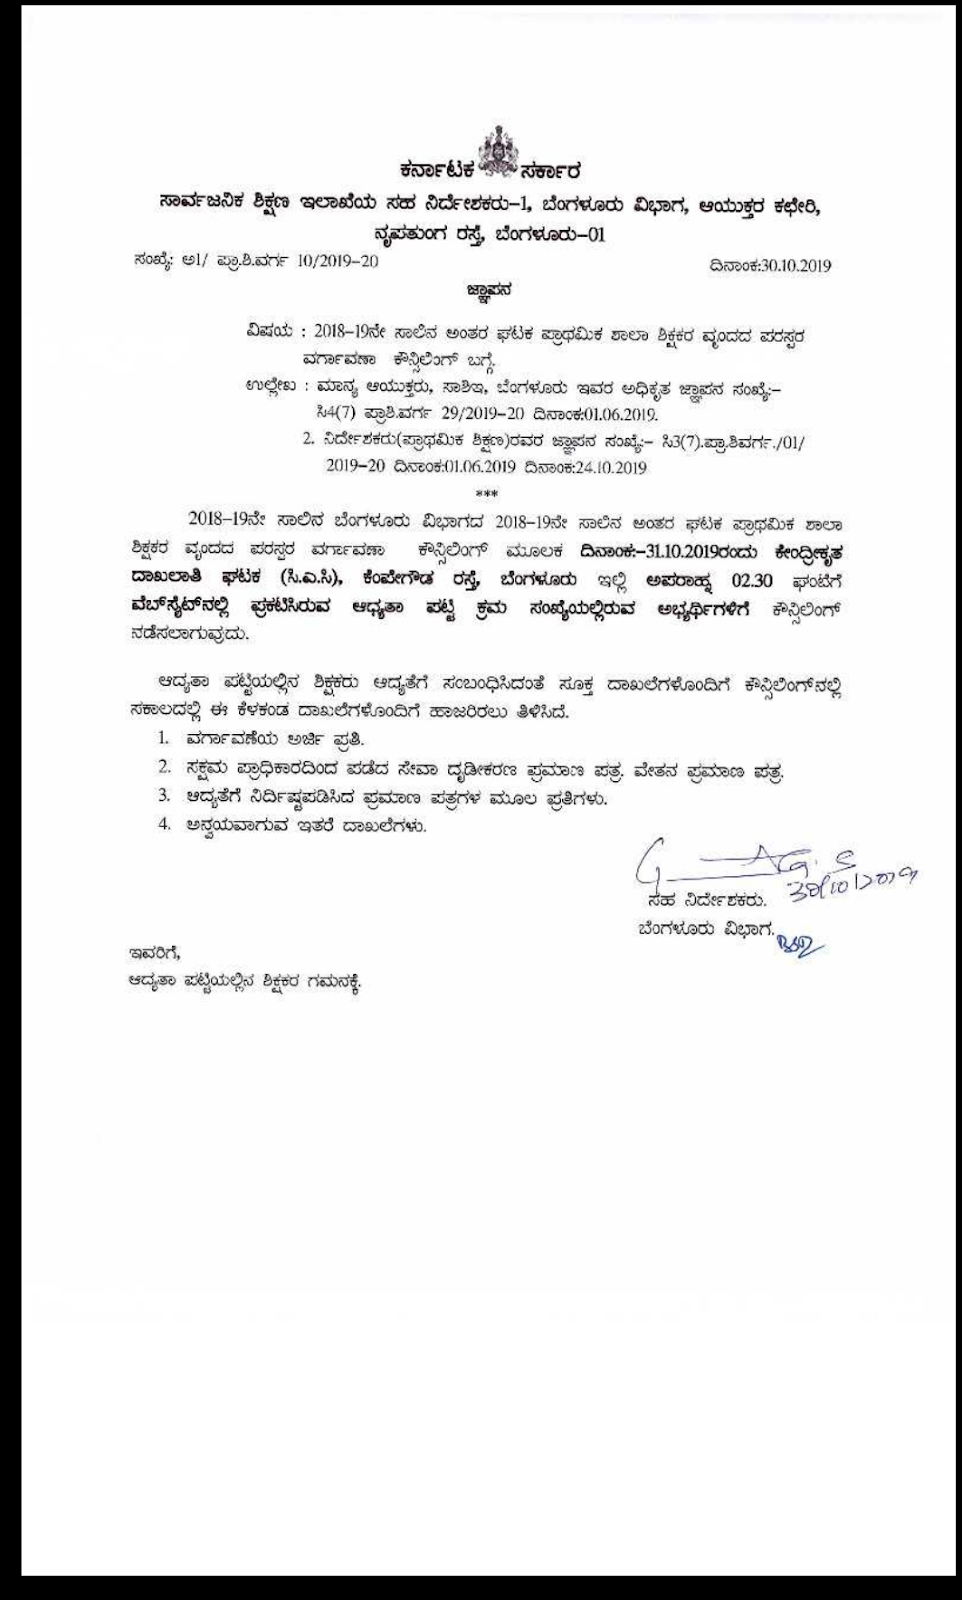 Mysore Division - Transfer Schedule Outside Primary School Teachers Unit